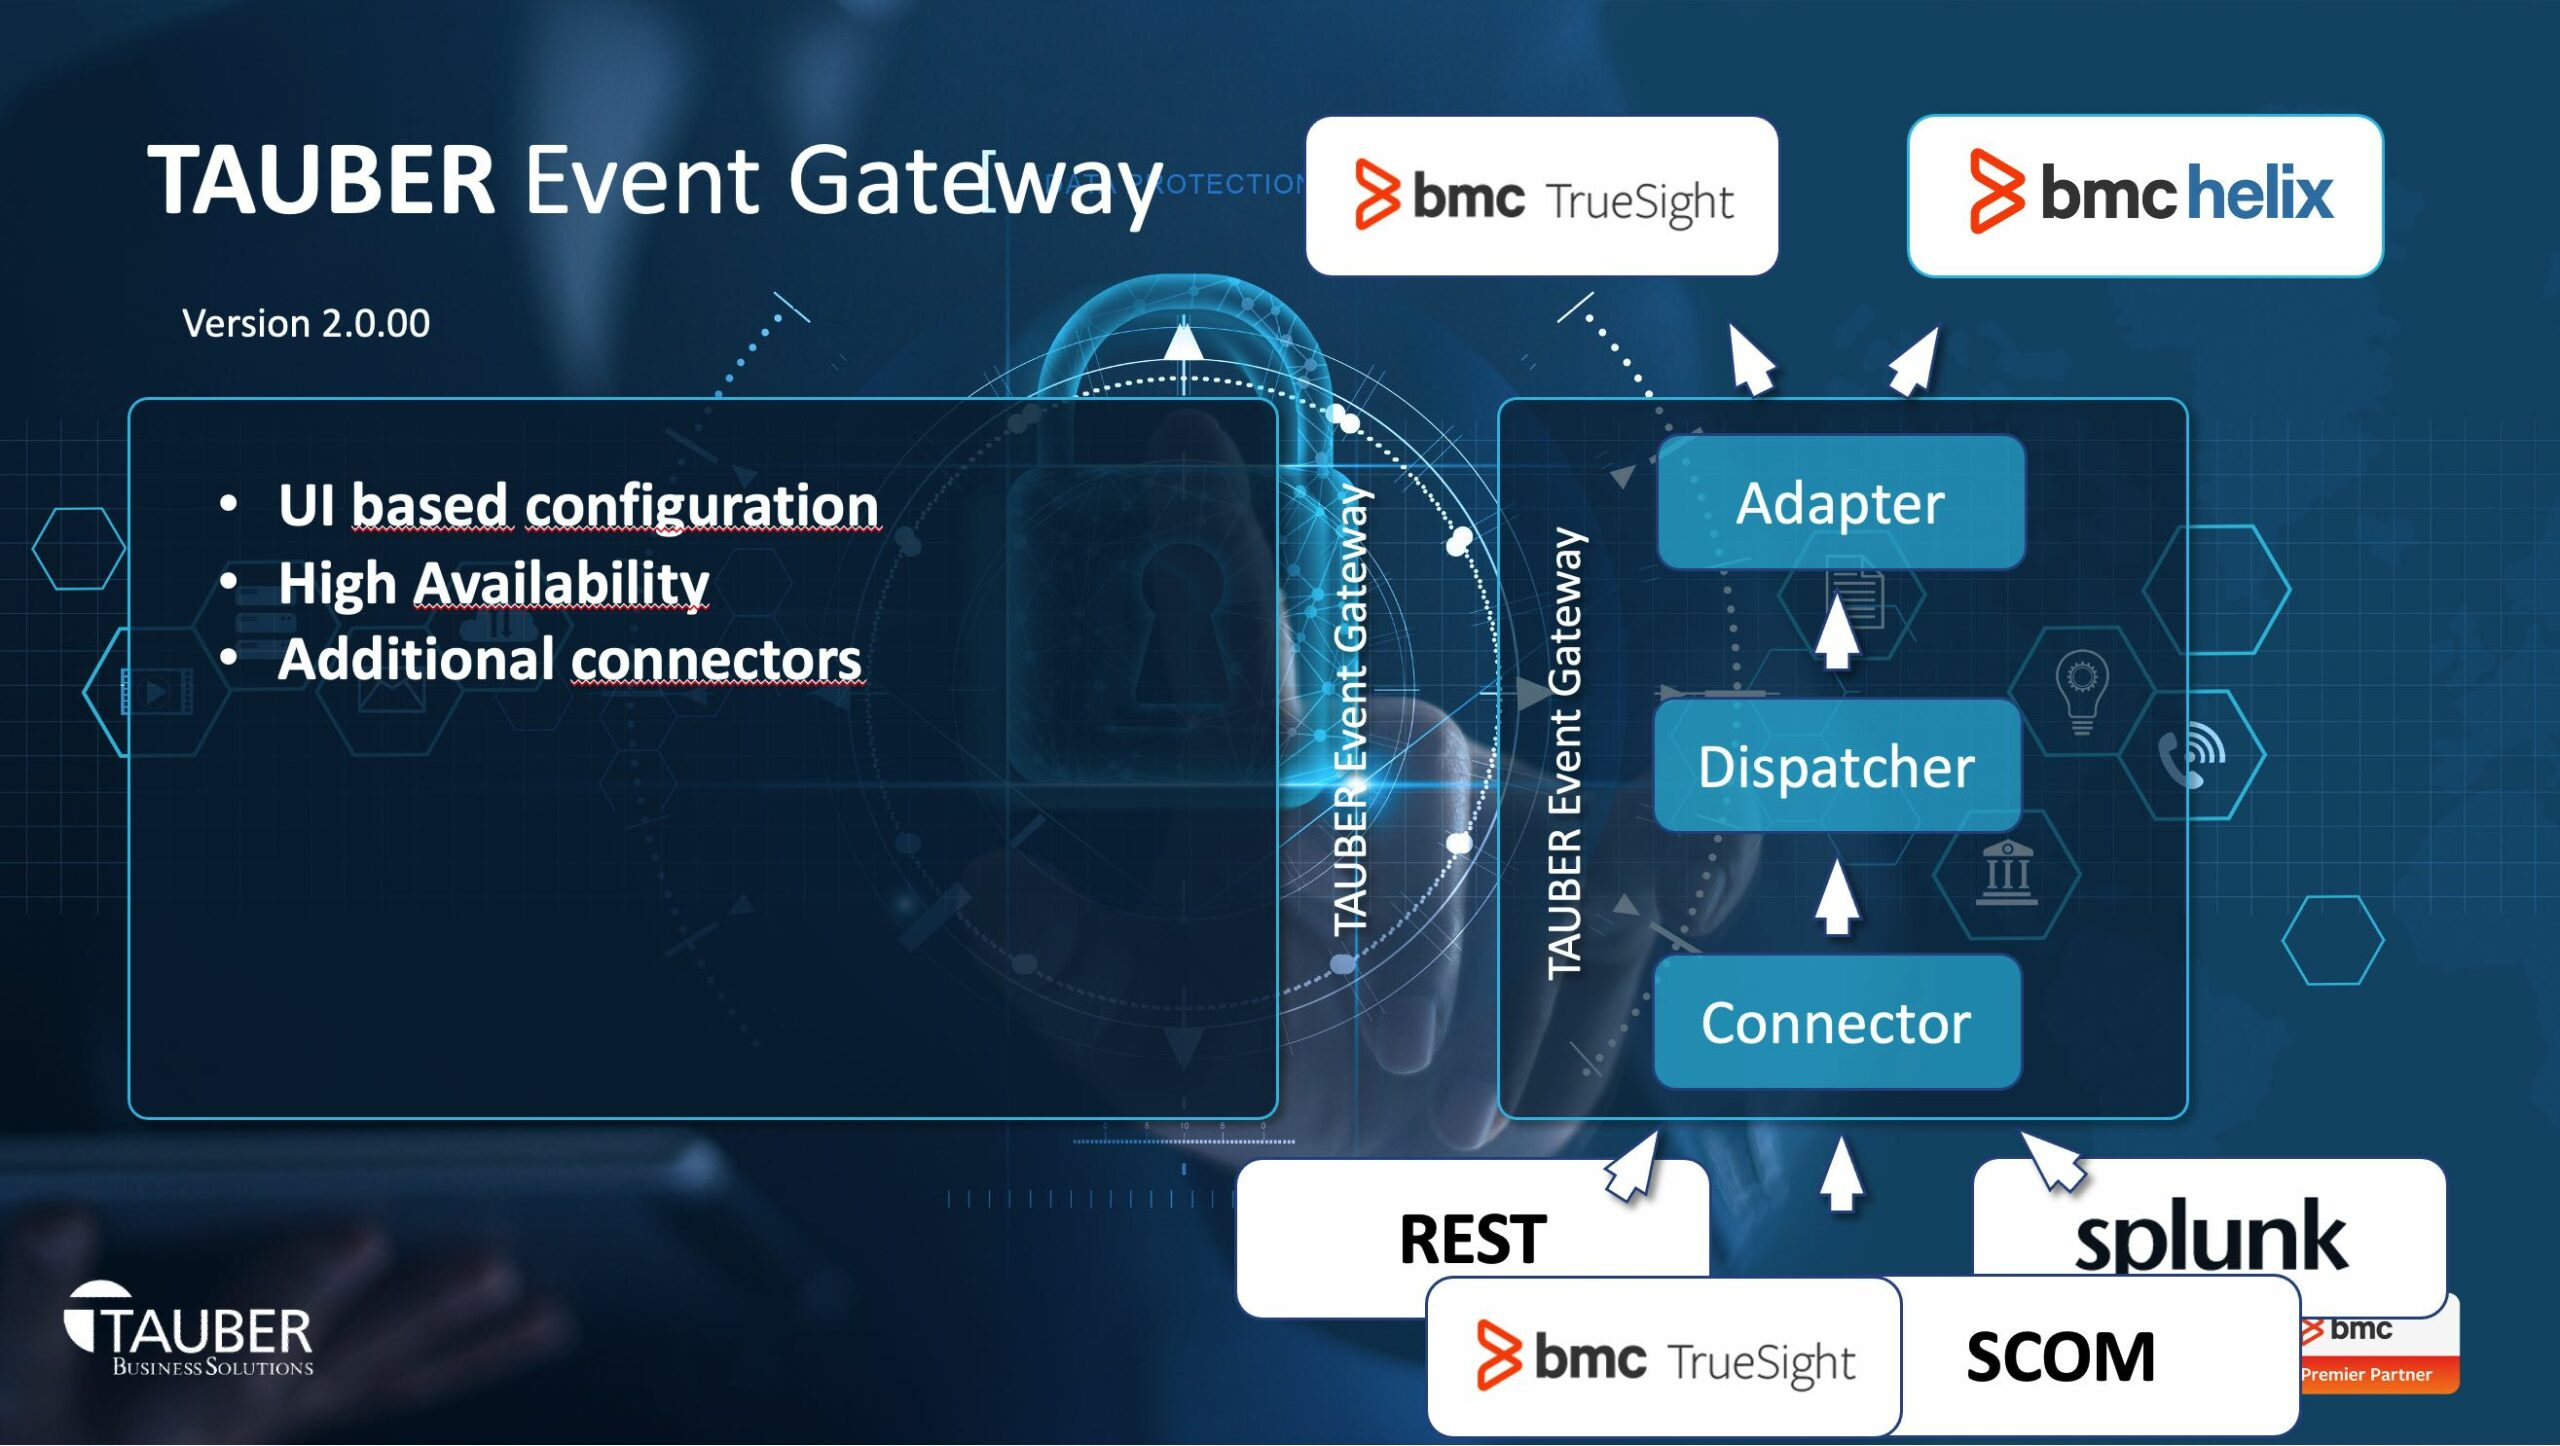 TAUBER Event Gateway / V2.0.00